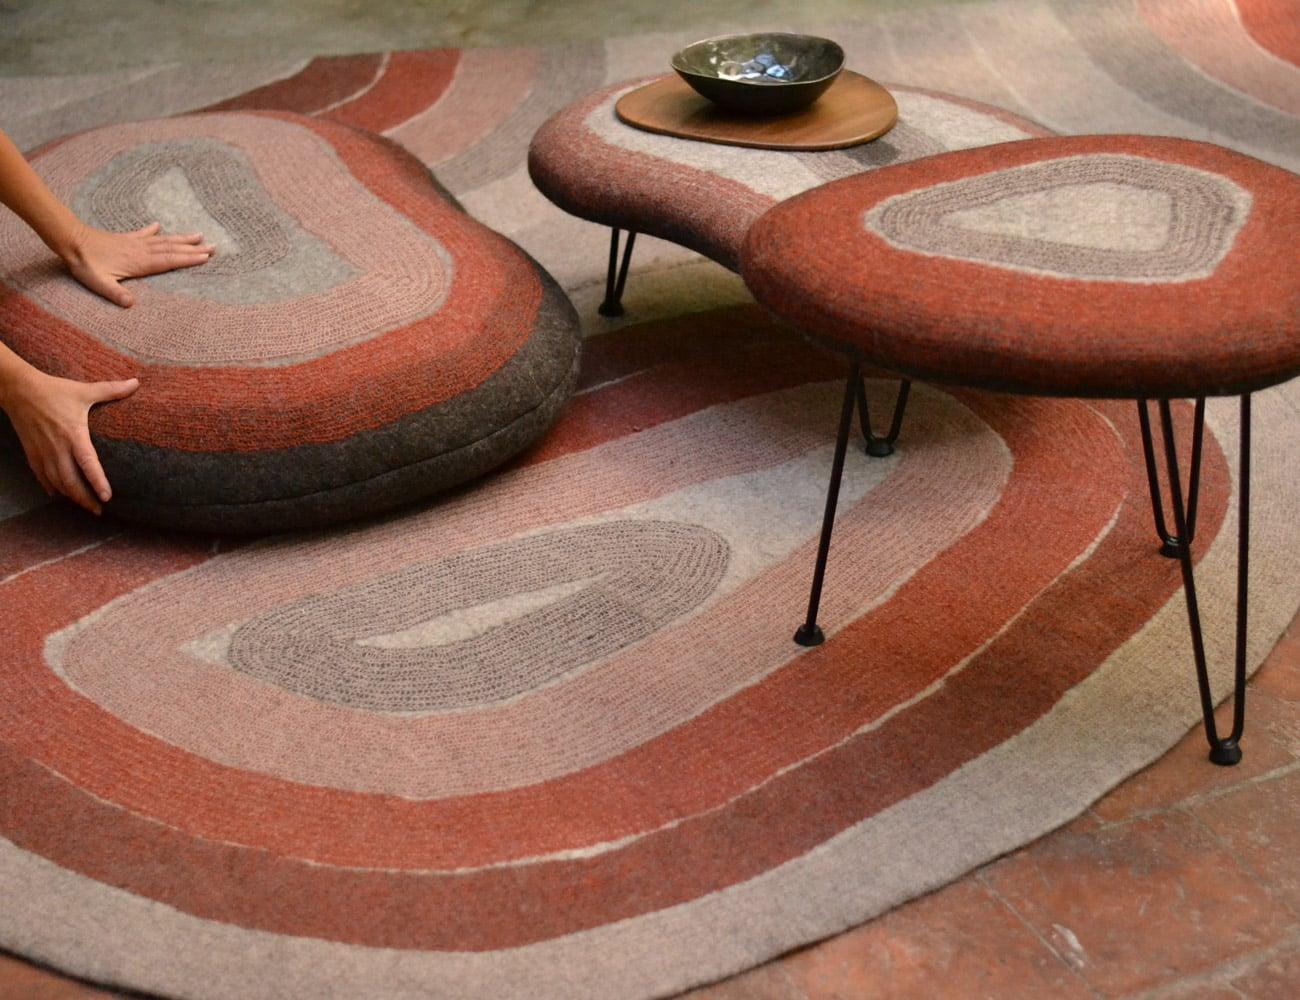 laine-fraiche-Ghislaine-Garcin-main-Coussin-tapis-table-feutre-laine